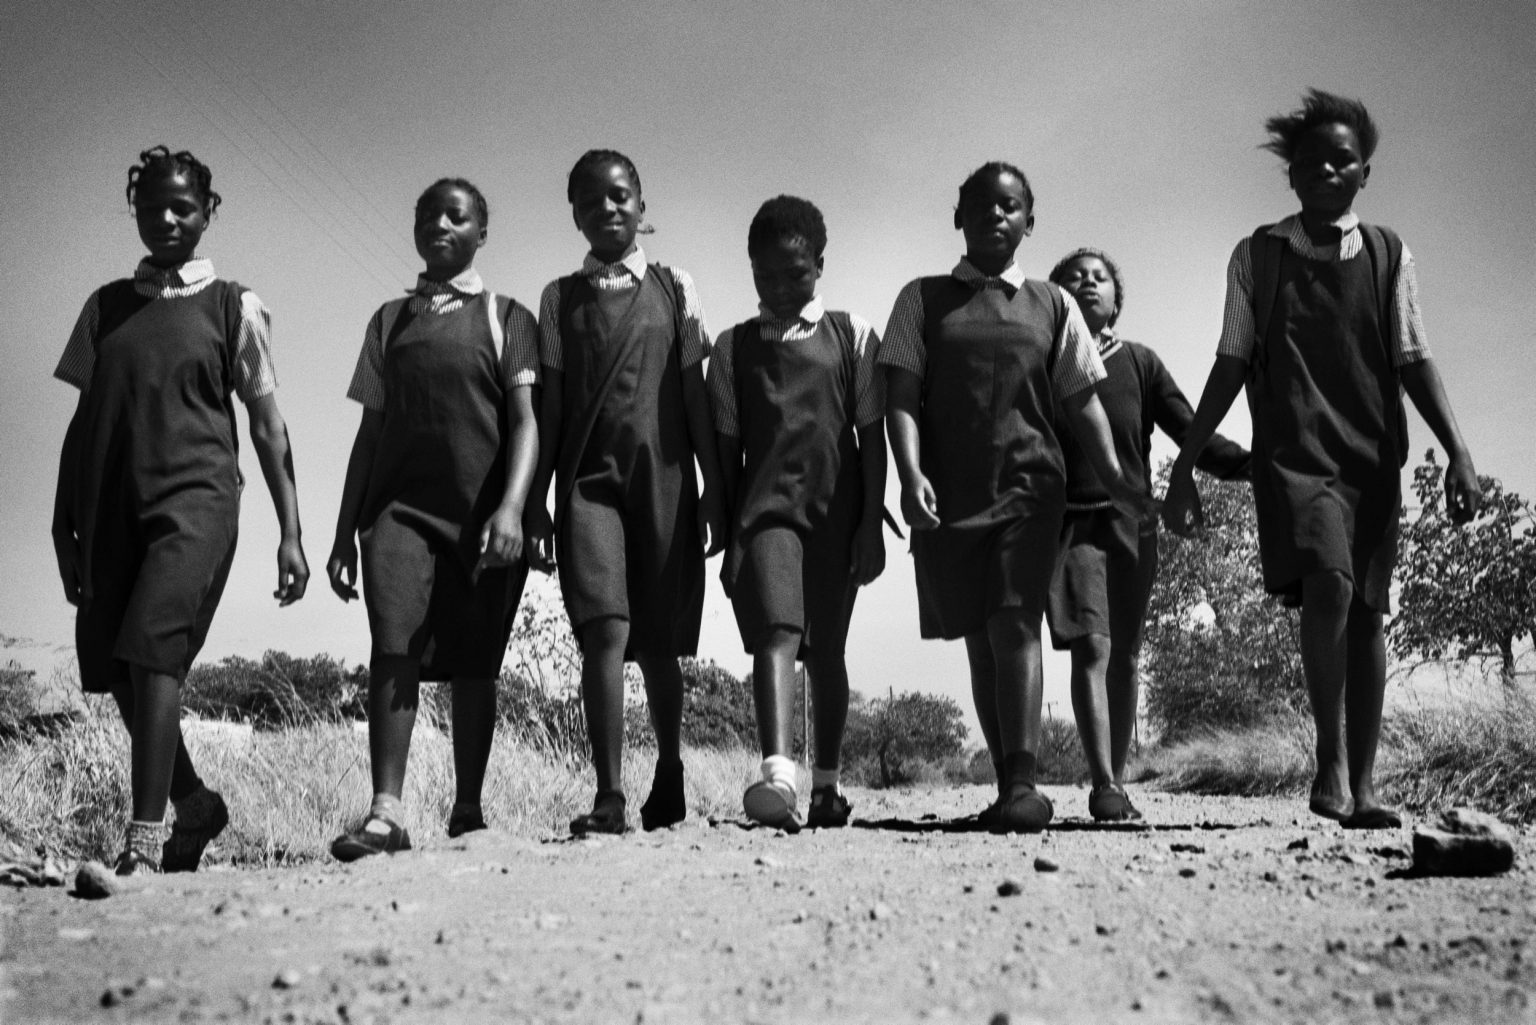 After having breakfast, the girls from Lonjedzani walk to school. Lusaka, Zambia, 2019